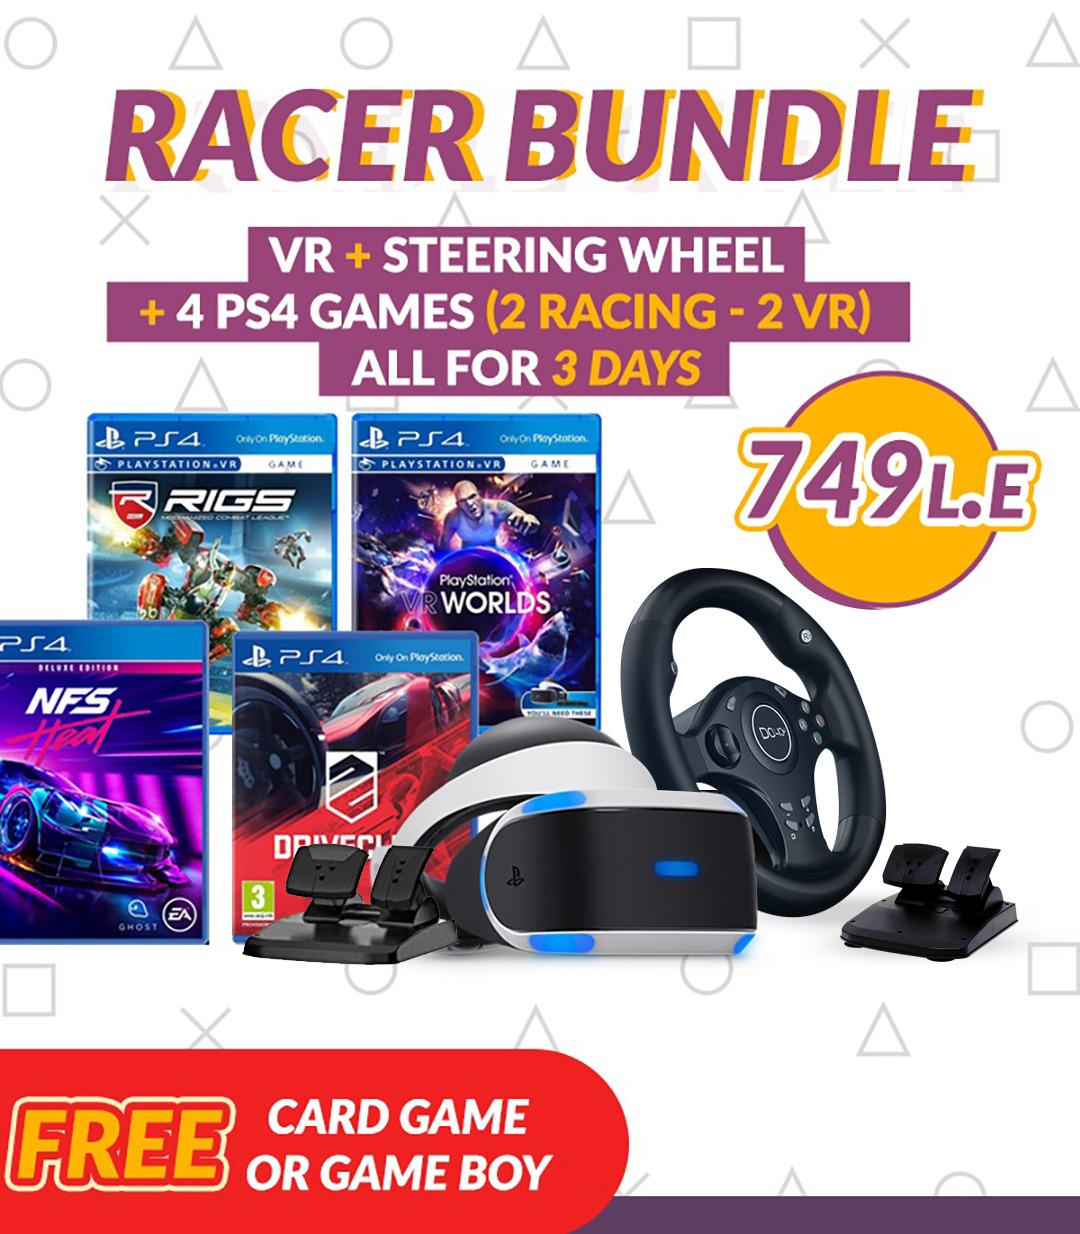 Racing Wheel & VR